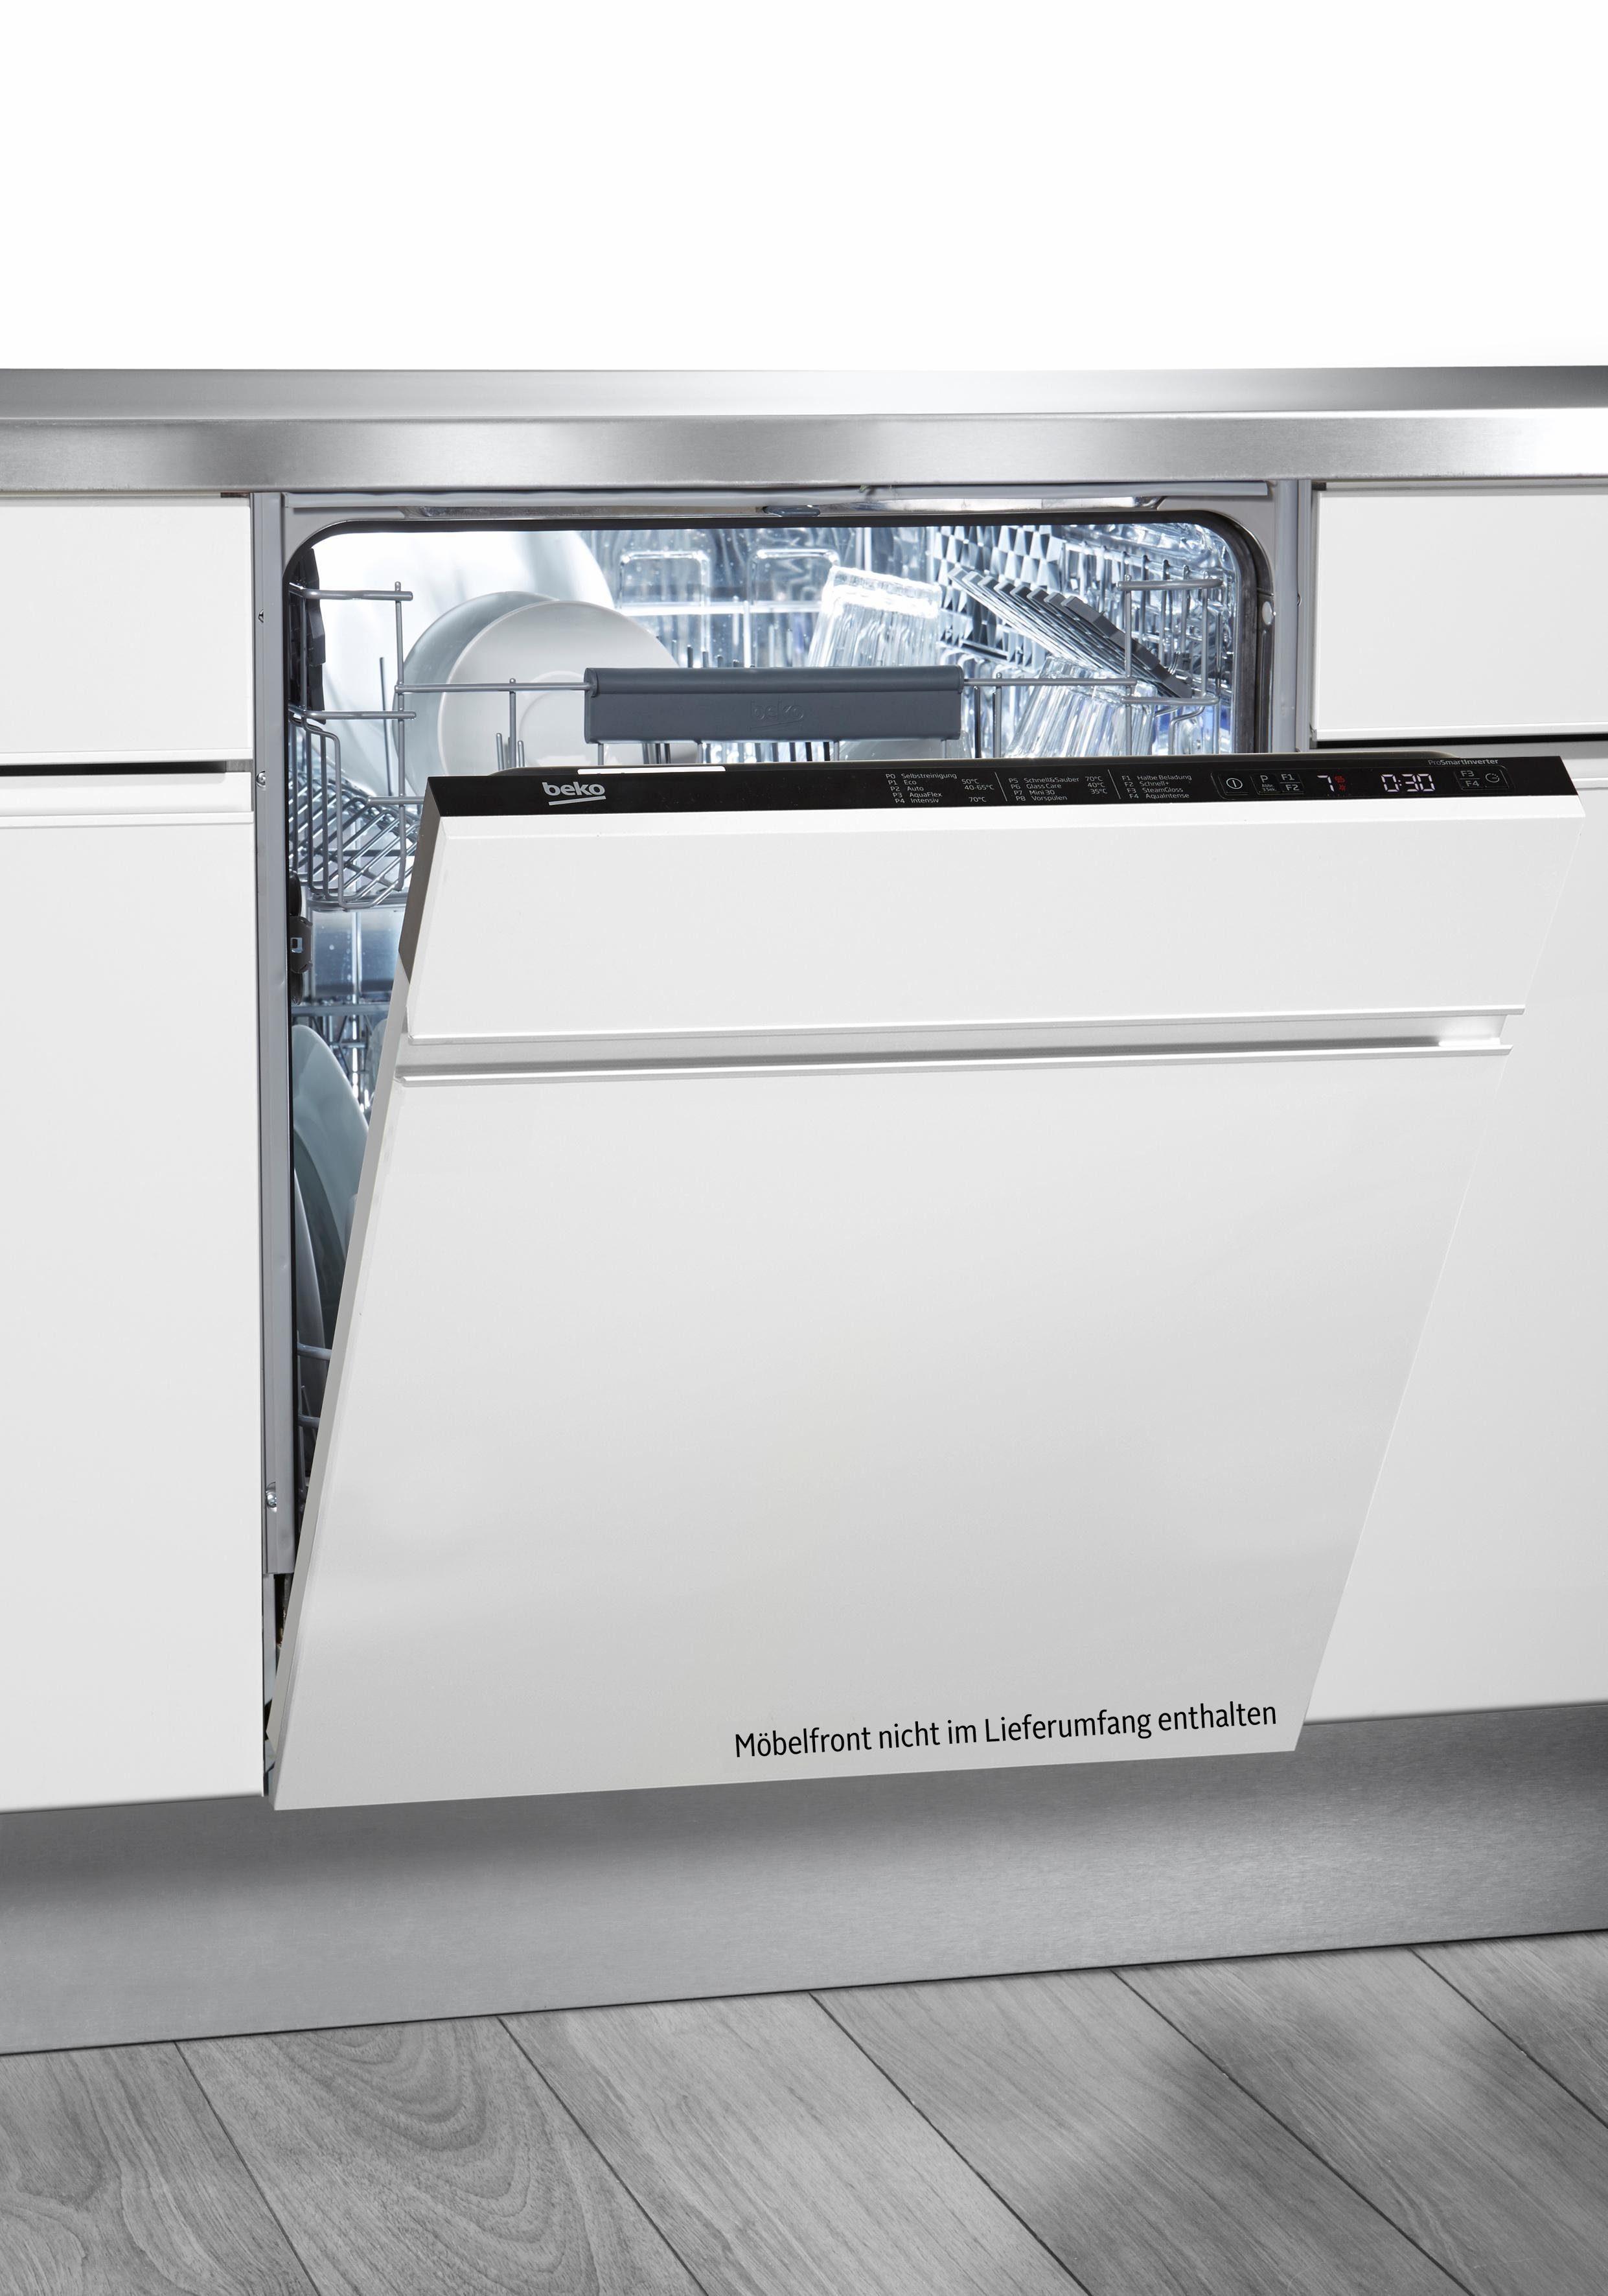 Beko vollintegrierter Einbau-Geschirrspüler DIT 28320, Energieklasse A++